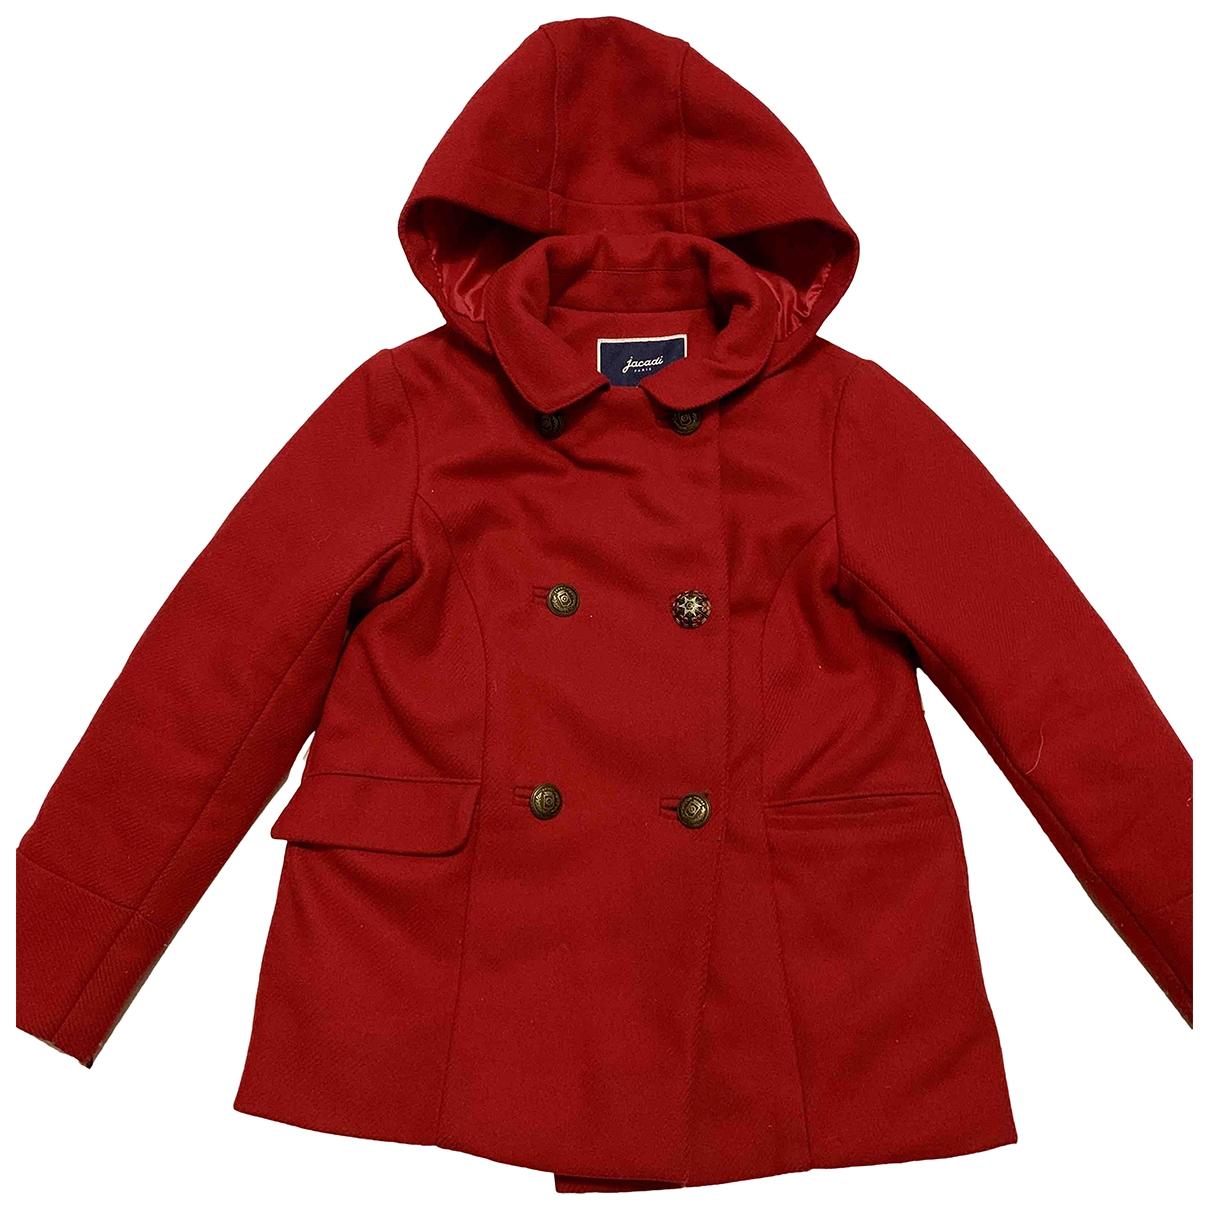 Jacadi \N Red Wool jacket & coat for Kids 10 years - up to 142cm FR